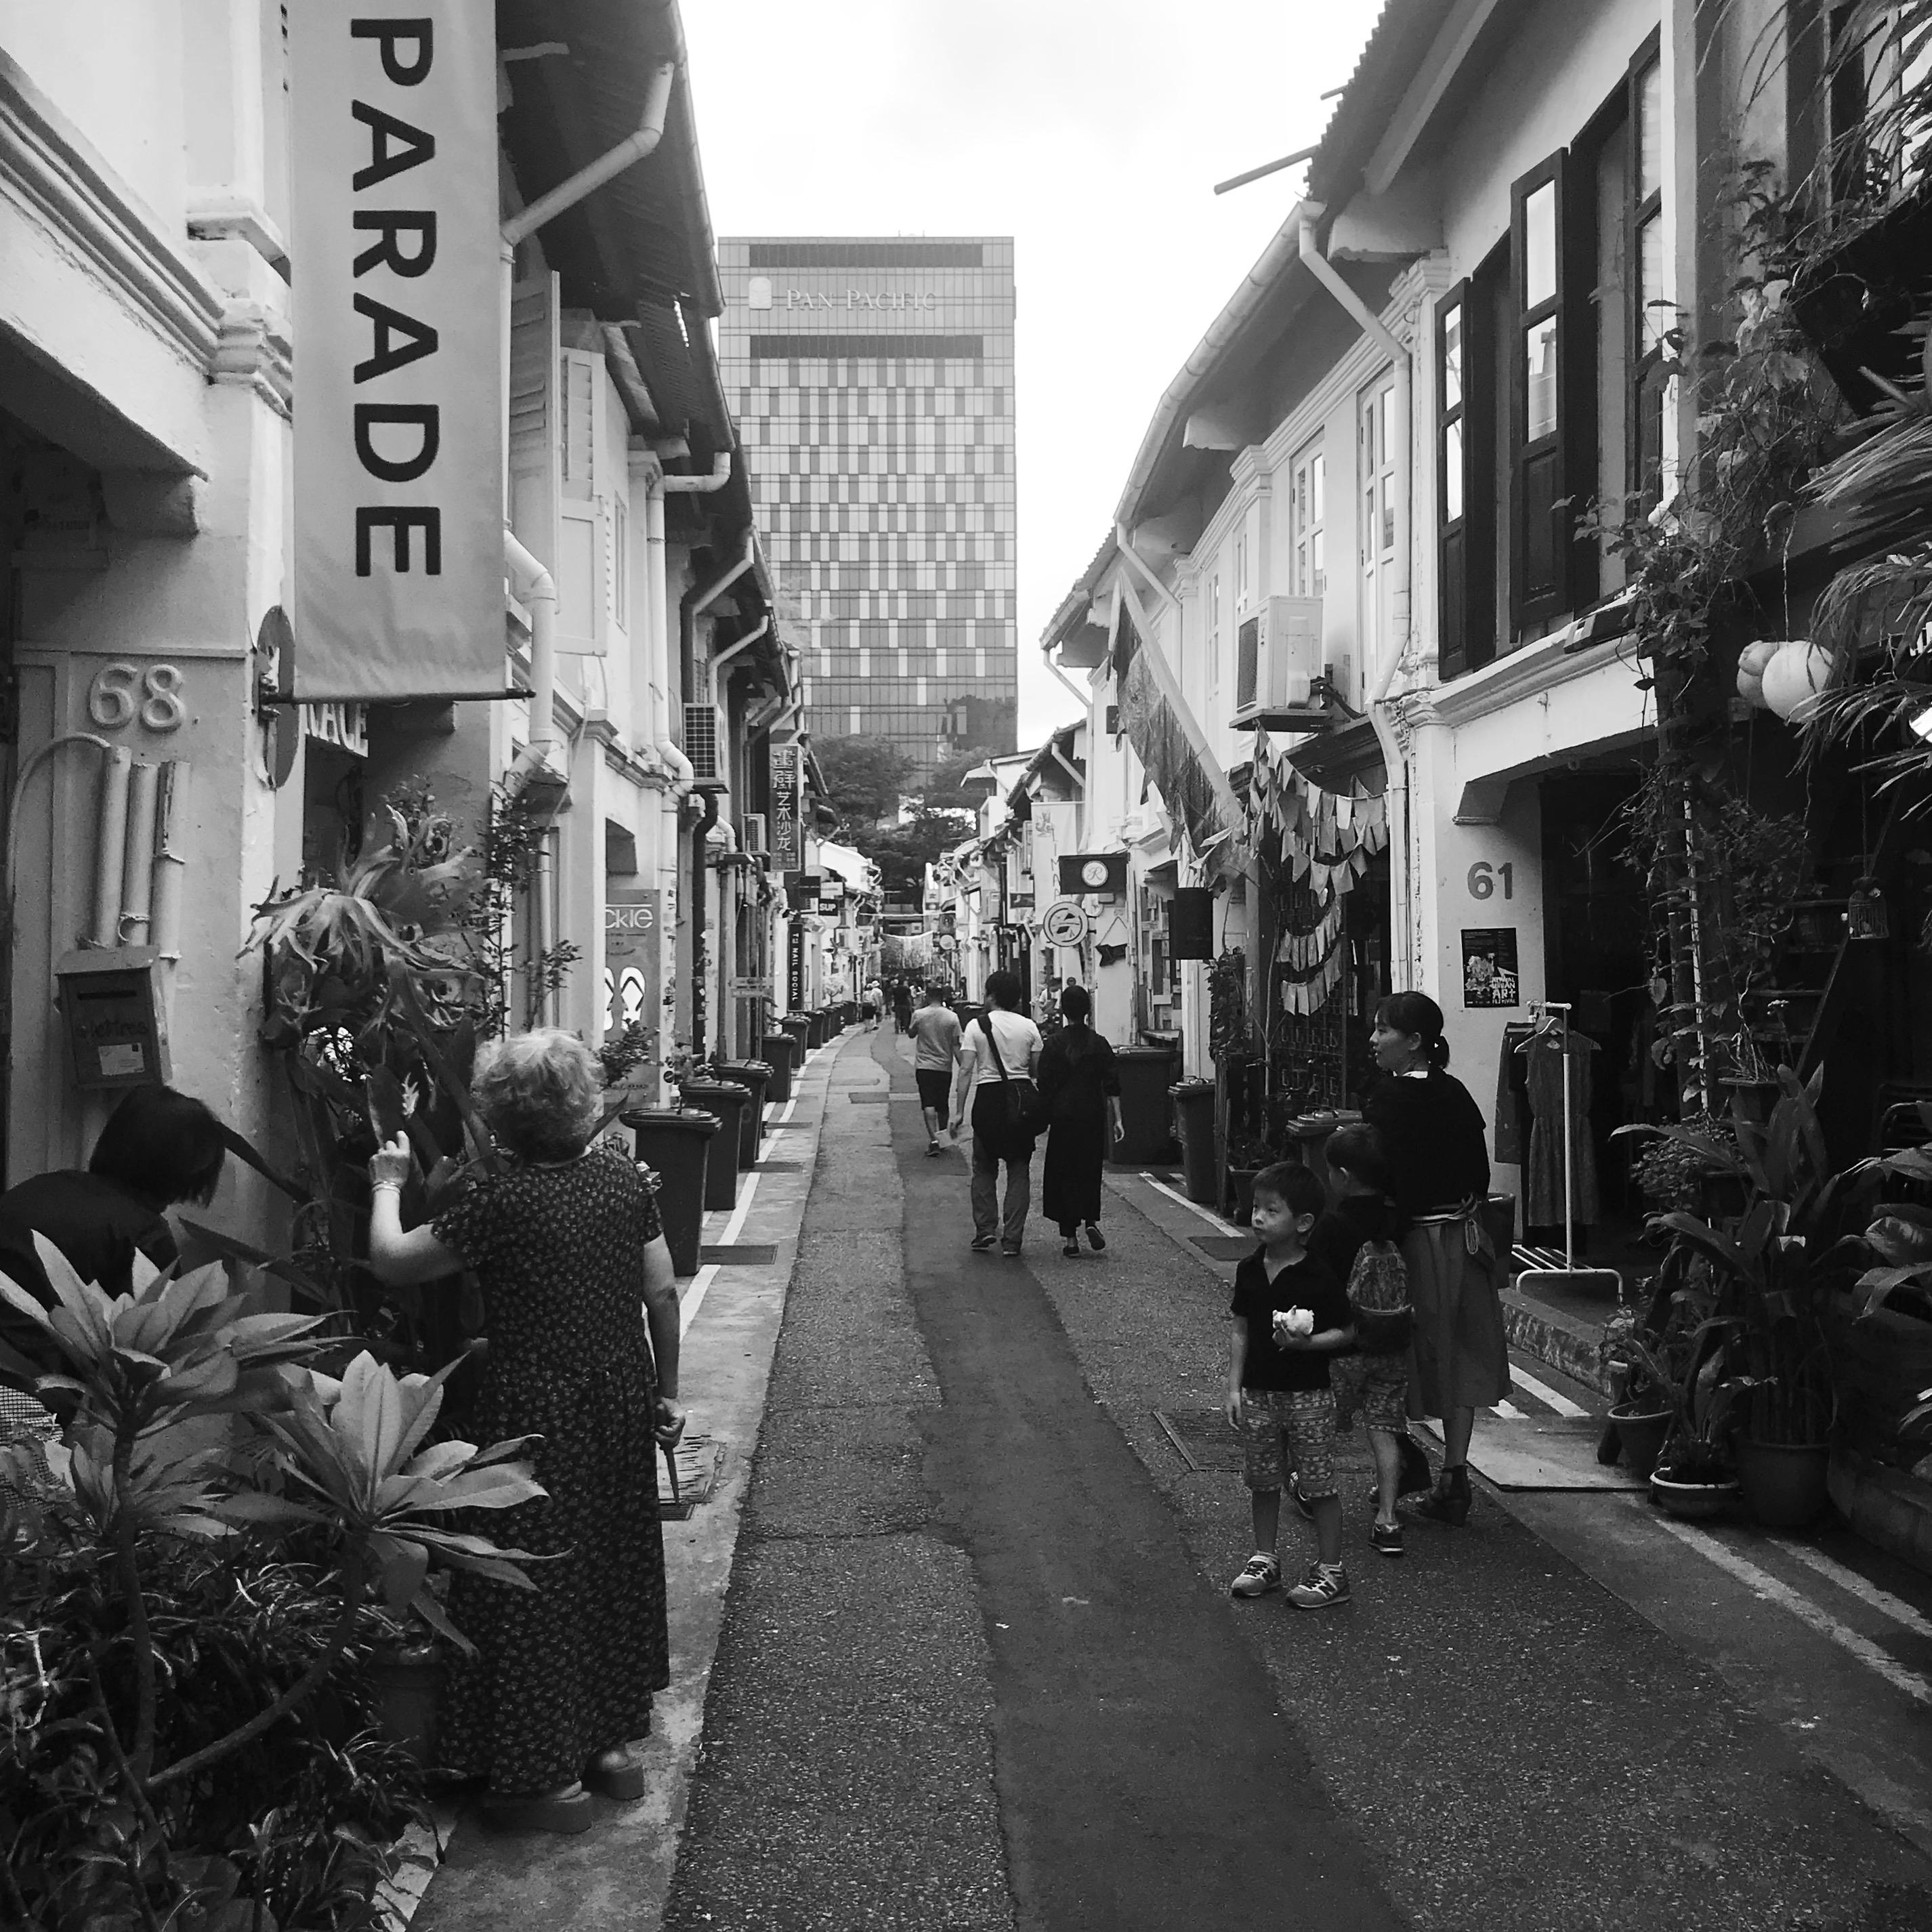 2. 2 JAN 18-Memory Palace_Remains of the day_Singaore Night.JPG